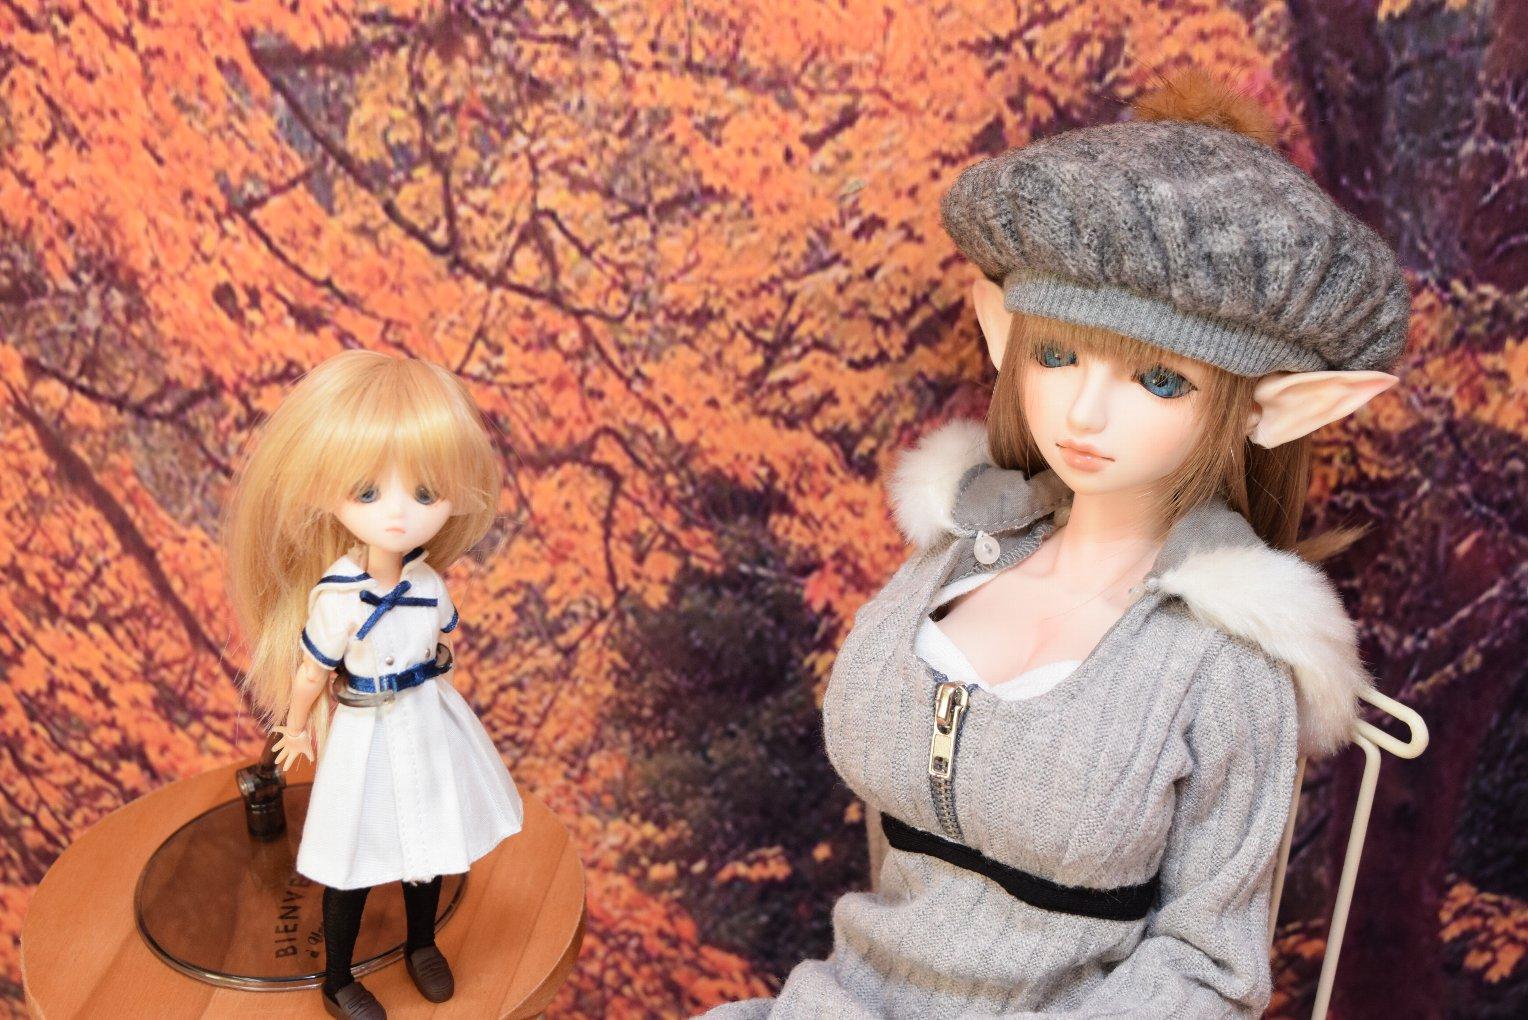 doll_4216.jpg